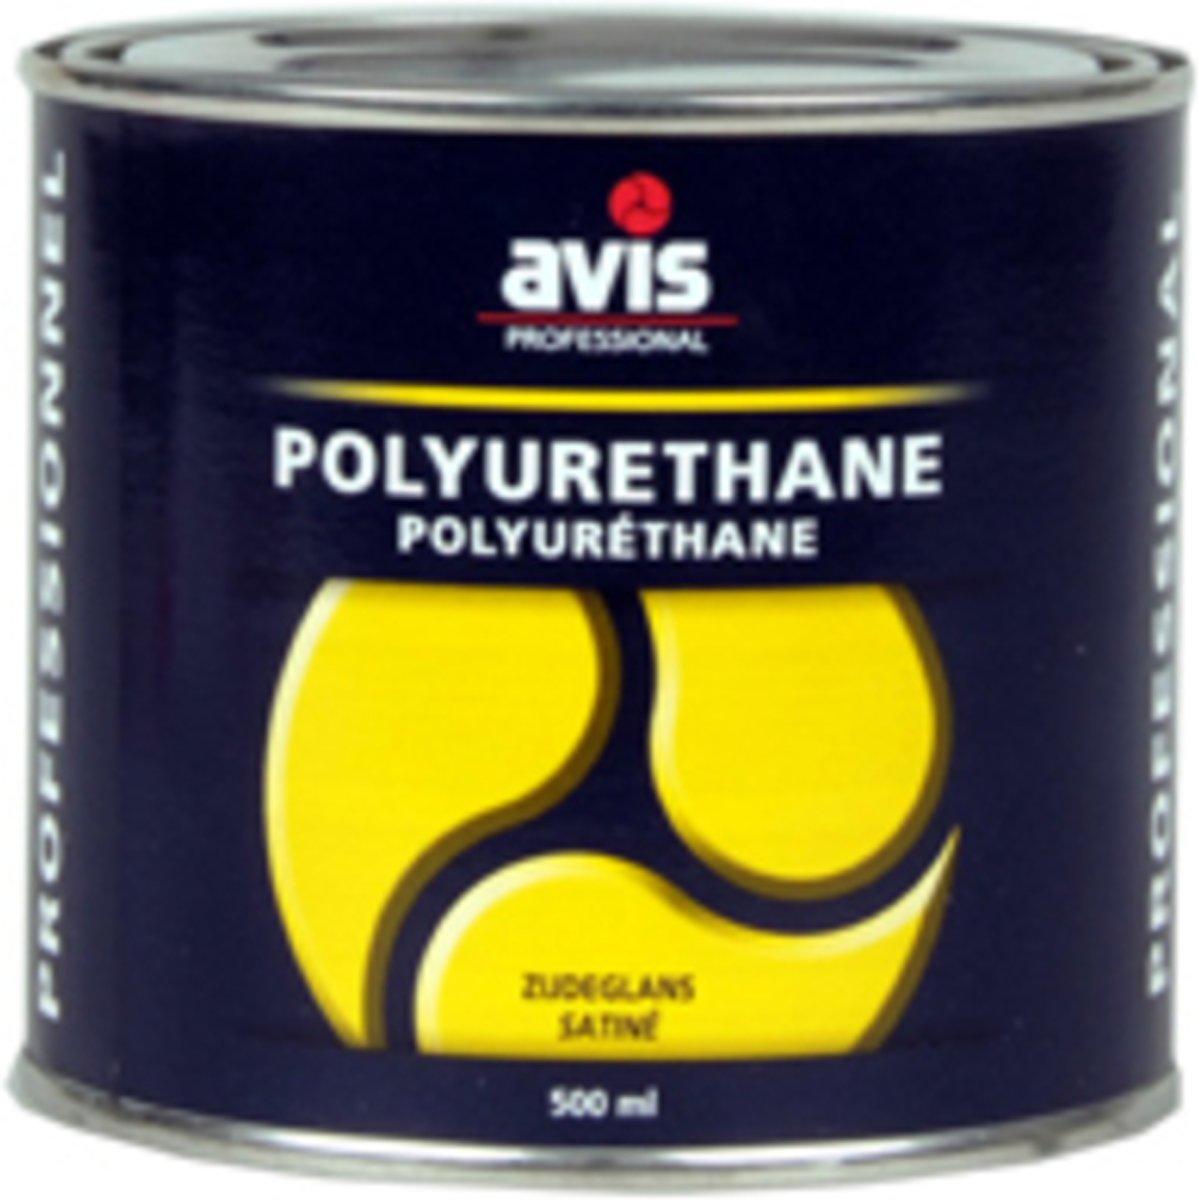 Avis Polyurethane Mat Blanke Lak - 500 ml